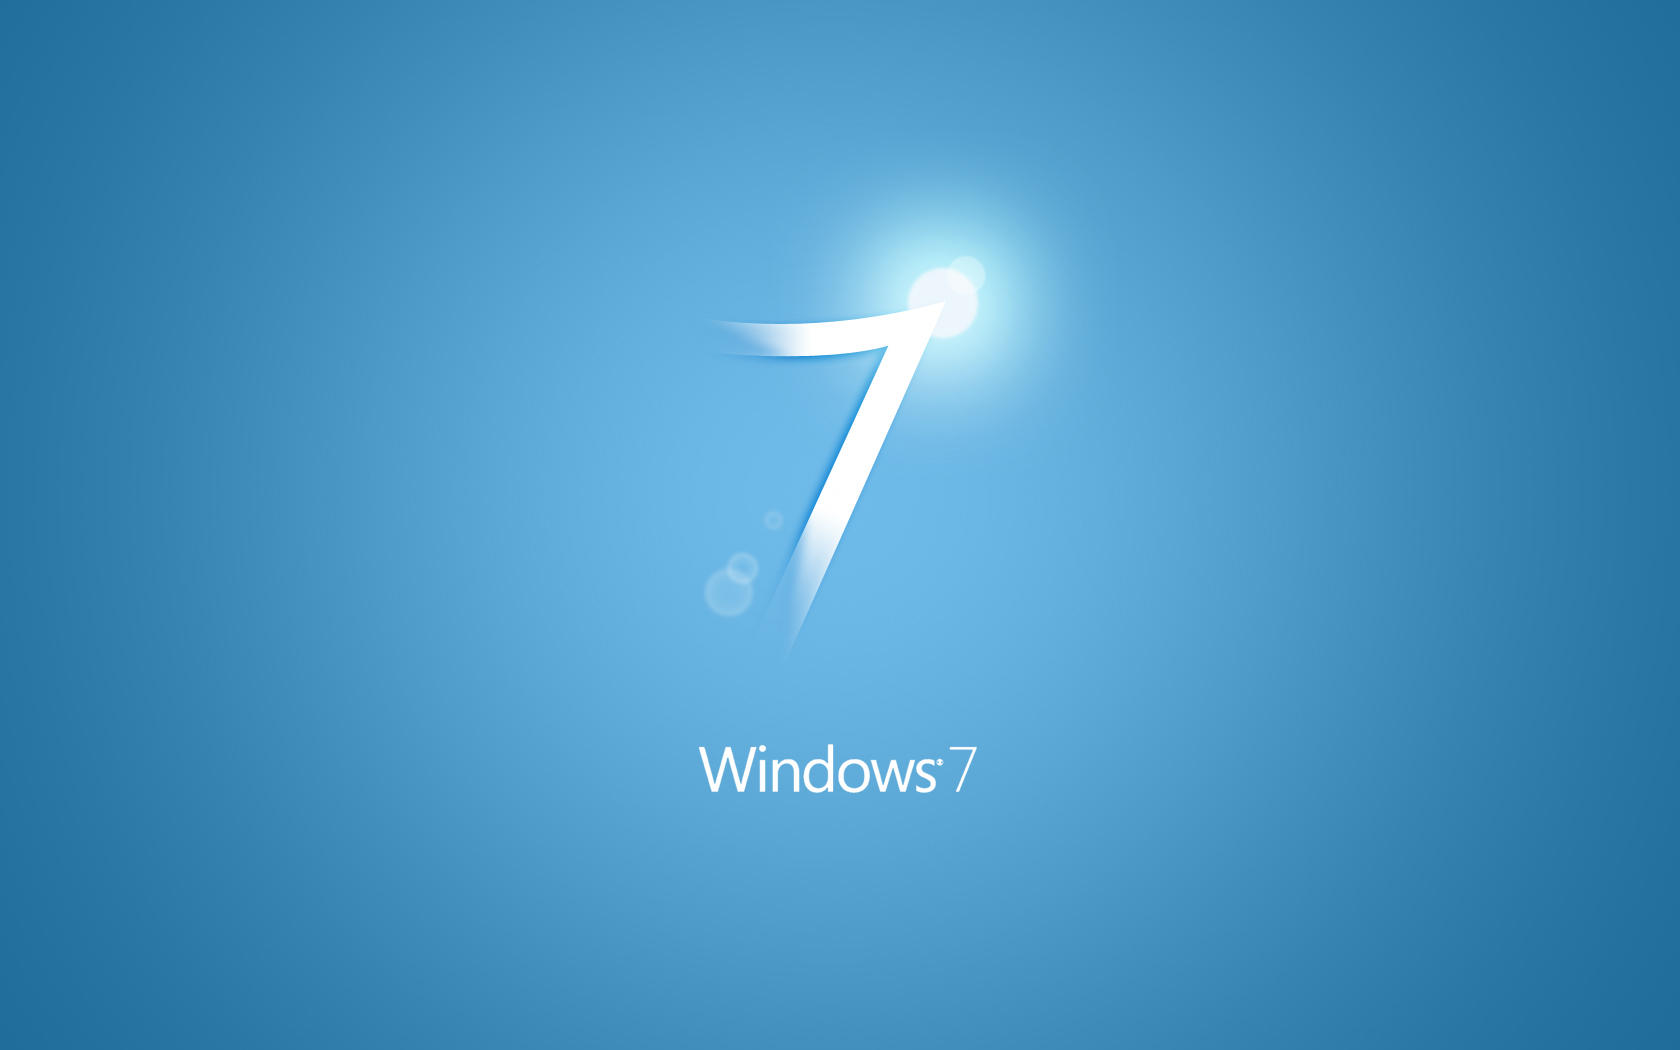 Windows 7 Screensaver by MarkyUppy83